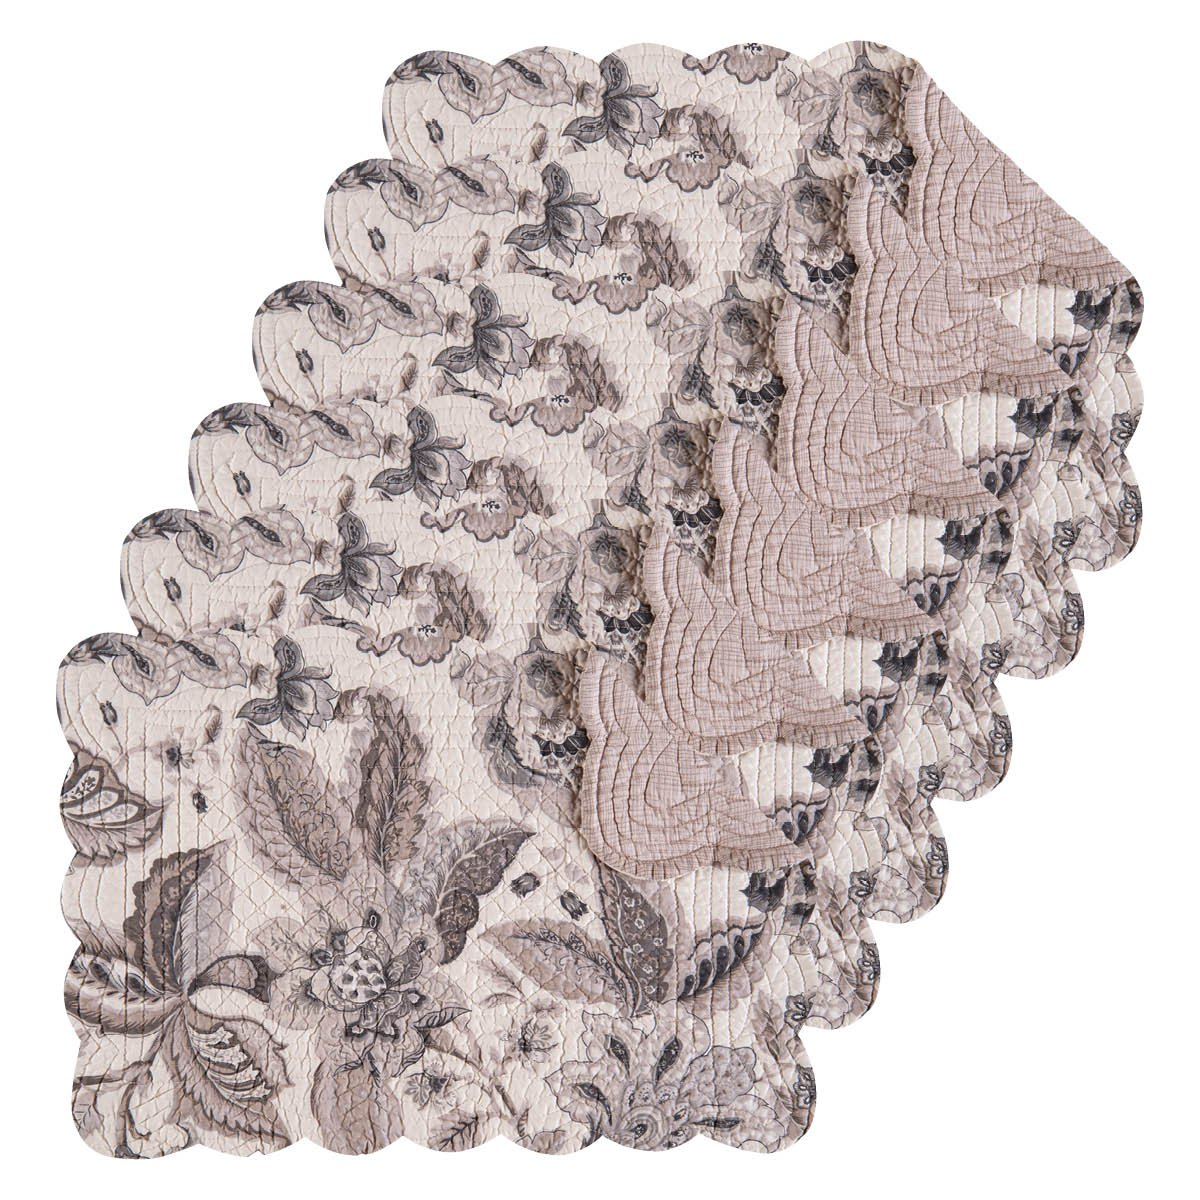 Aurelia Tabletop親 Rectangular Placemat Set of 6 グレー 862621861S6 Rectangular Placemat Set of 6  B075VNCSYW